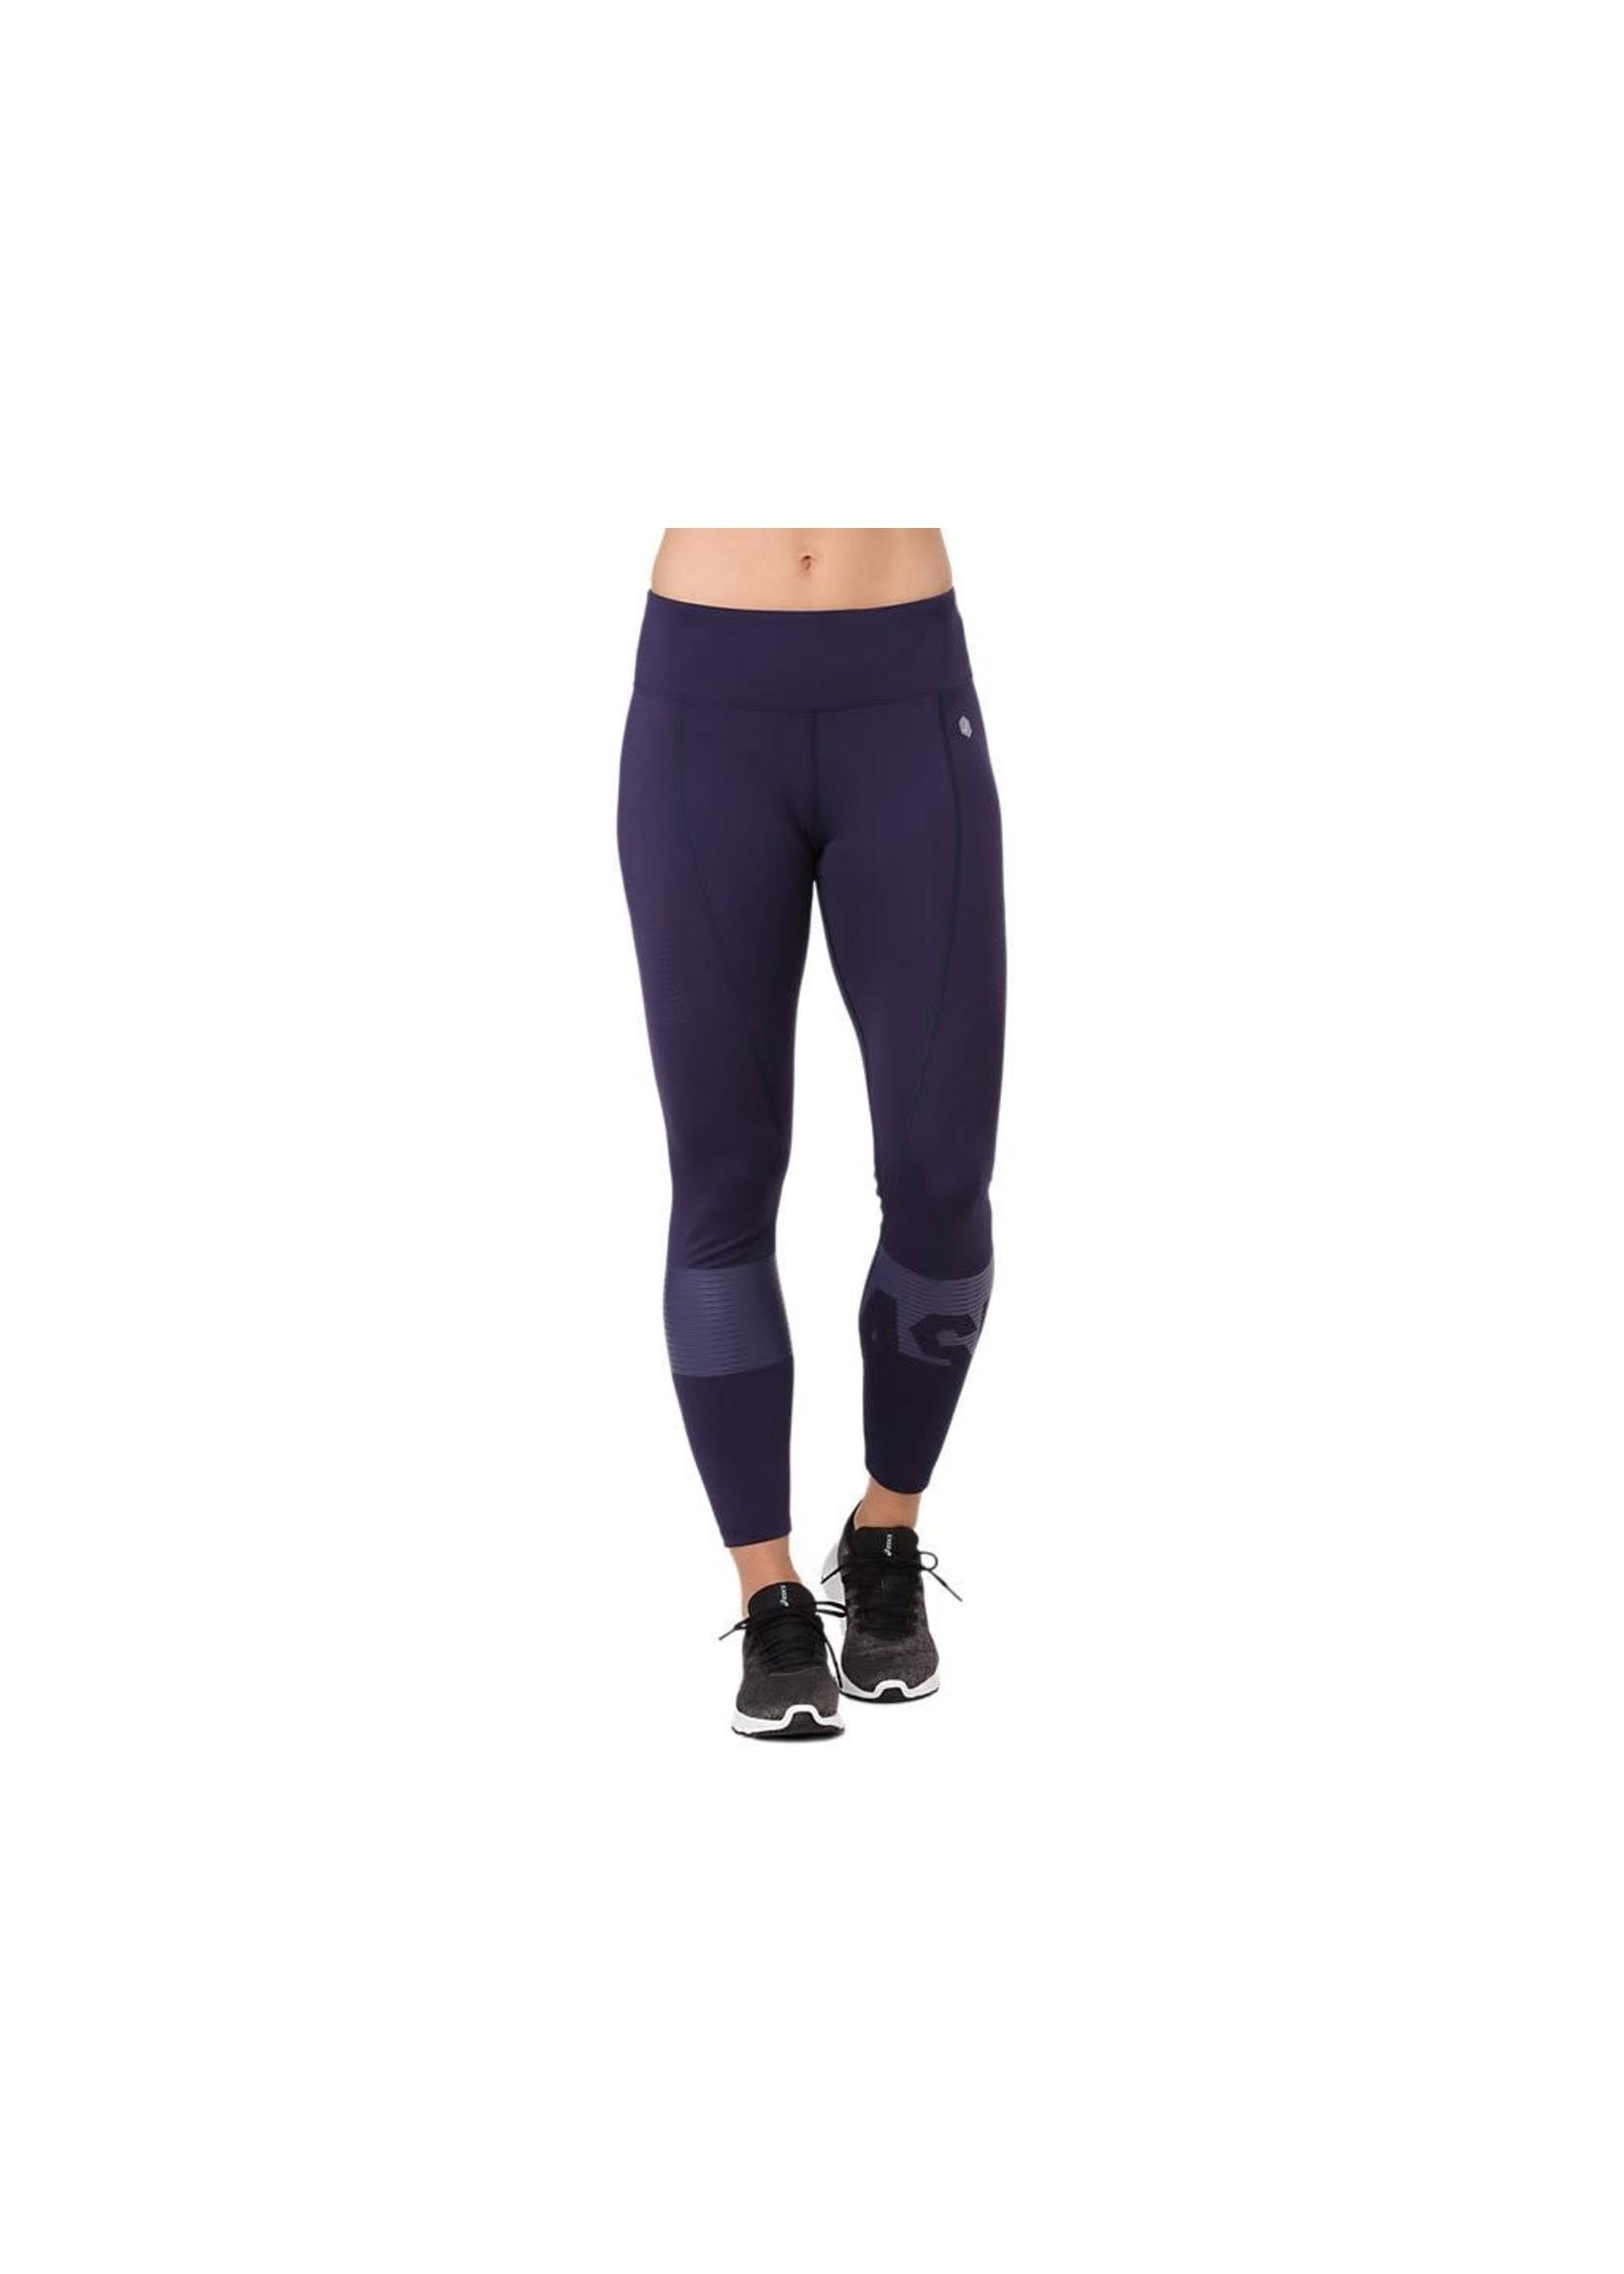 Asics Asics Cropped Ladies Running Tight (2019)